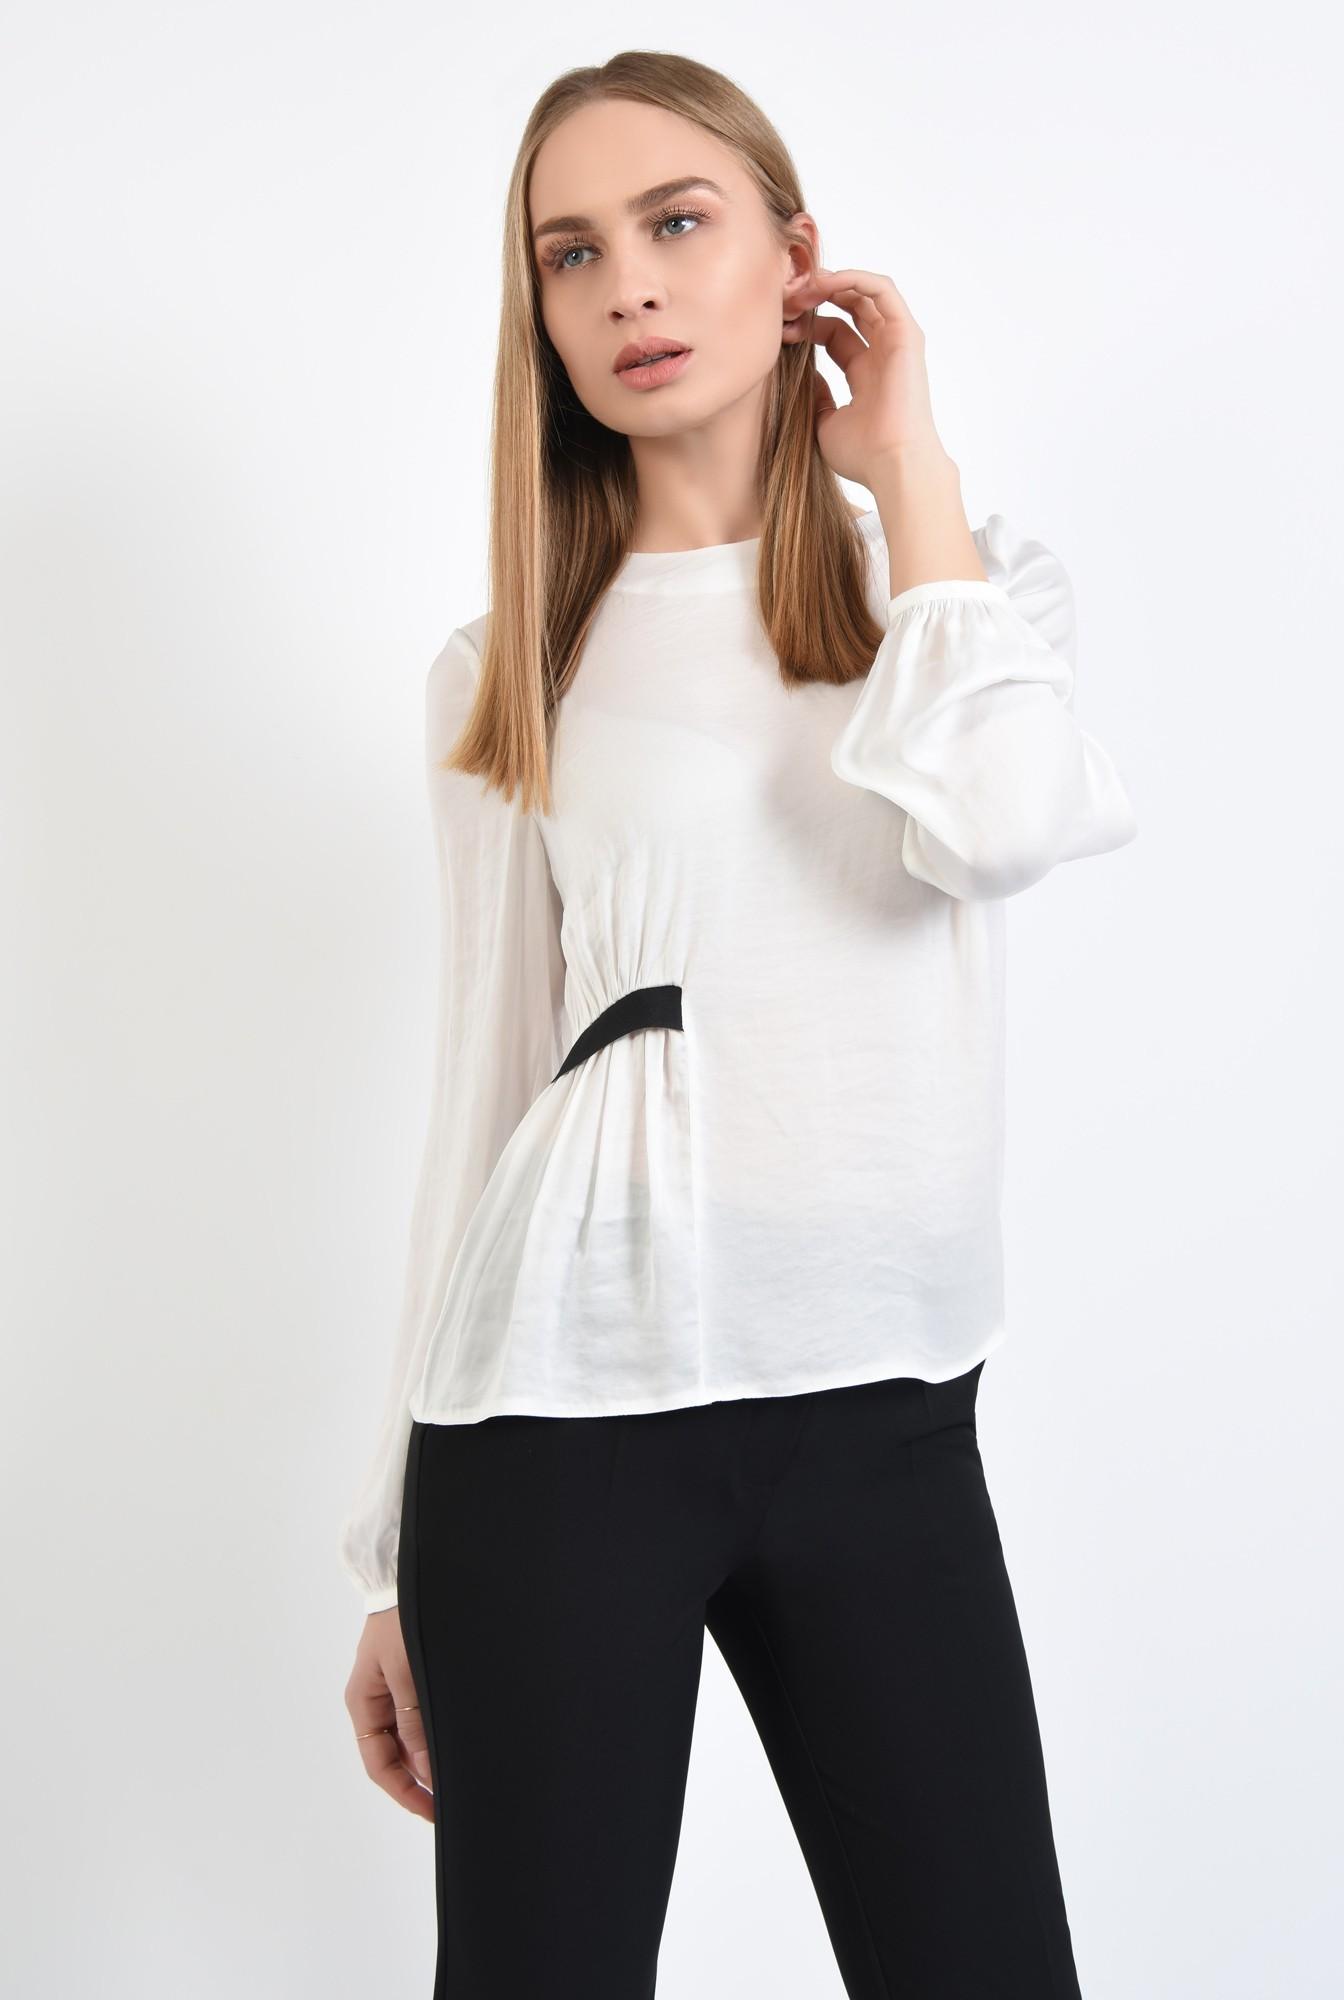 0 - 360 - bluza cu rips, casual, croi lejer, maneci lungi